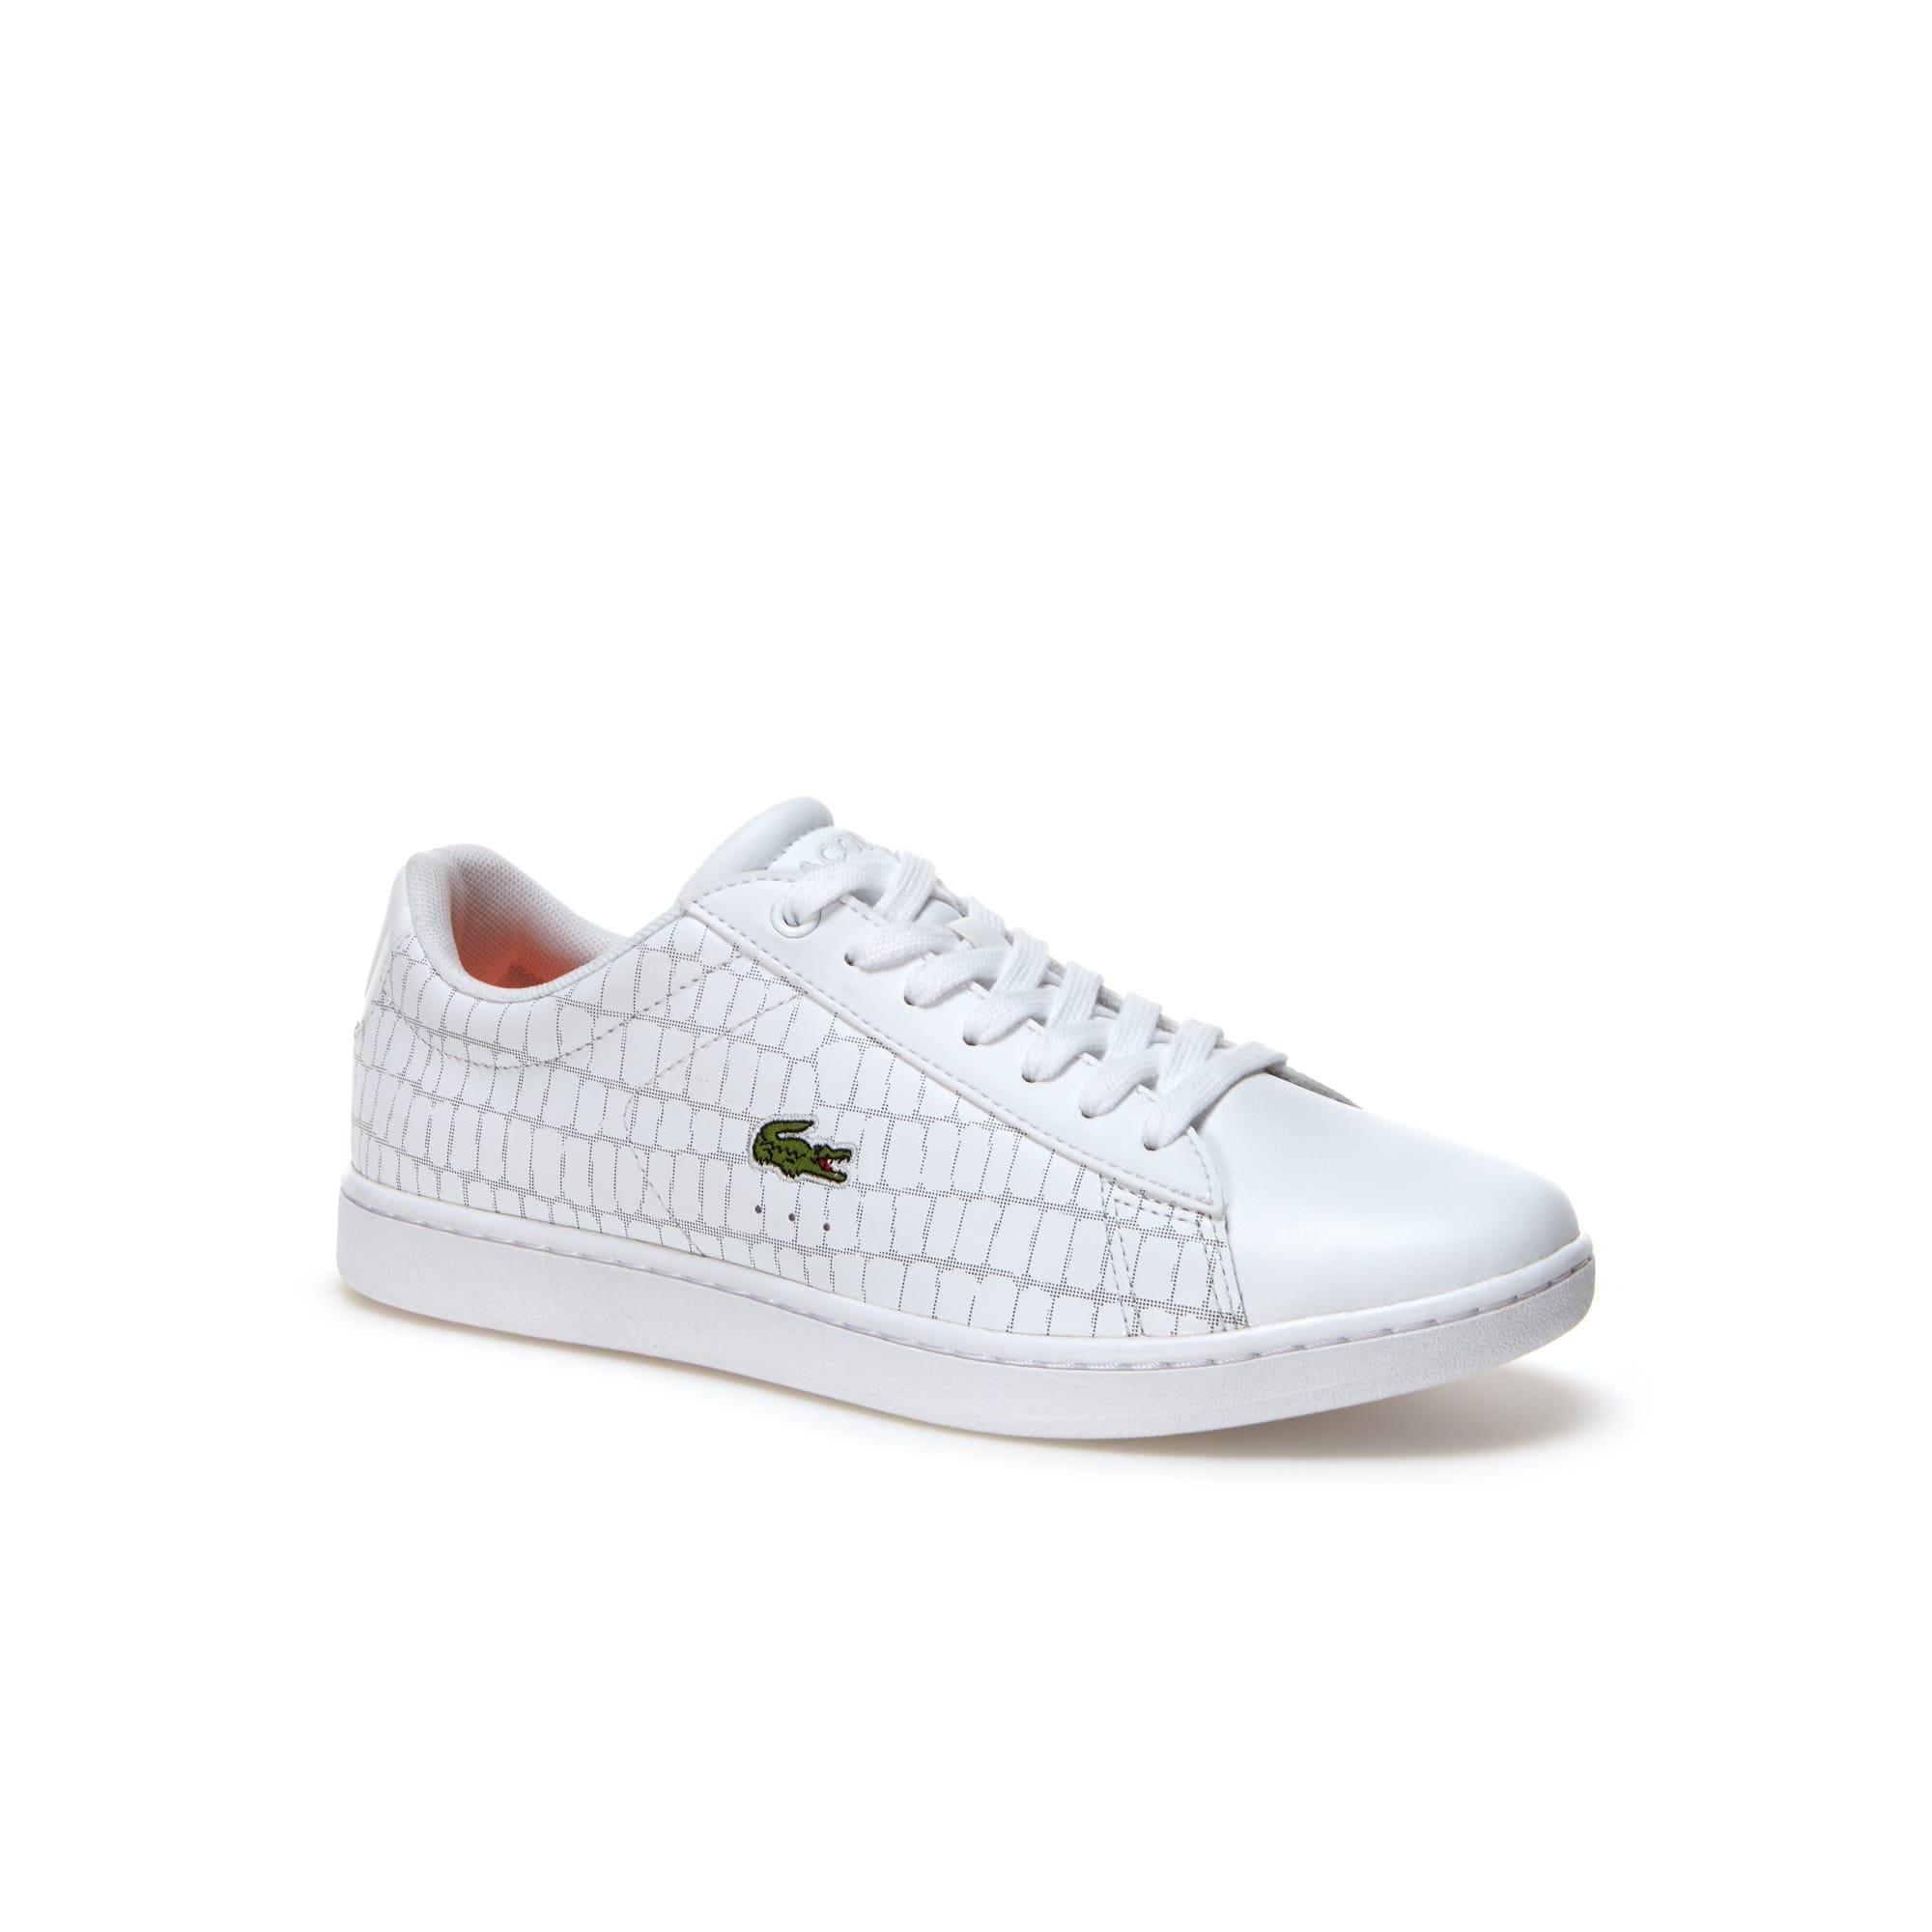 Sneakers Carnaby Evo en cuir avec crocodile imprimé